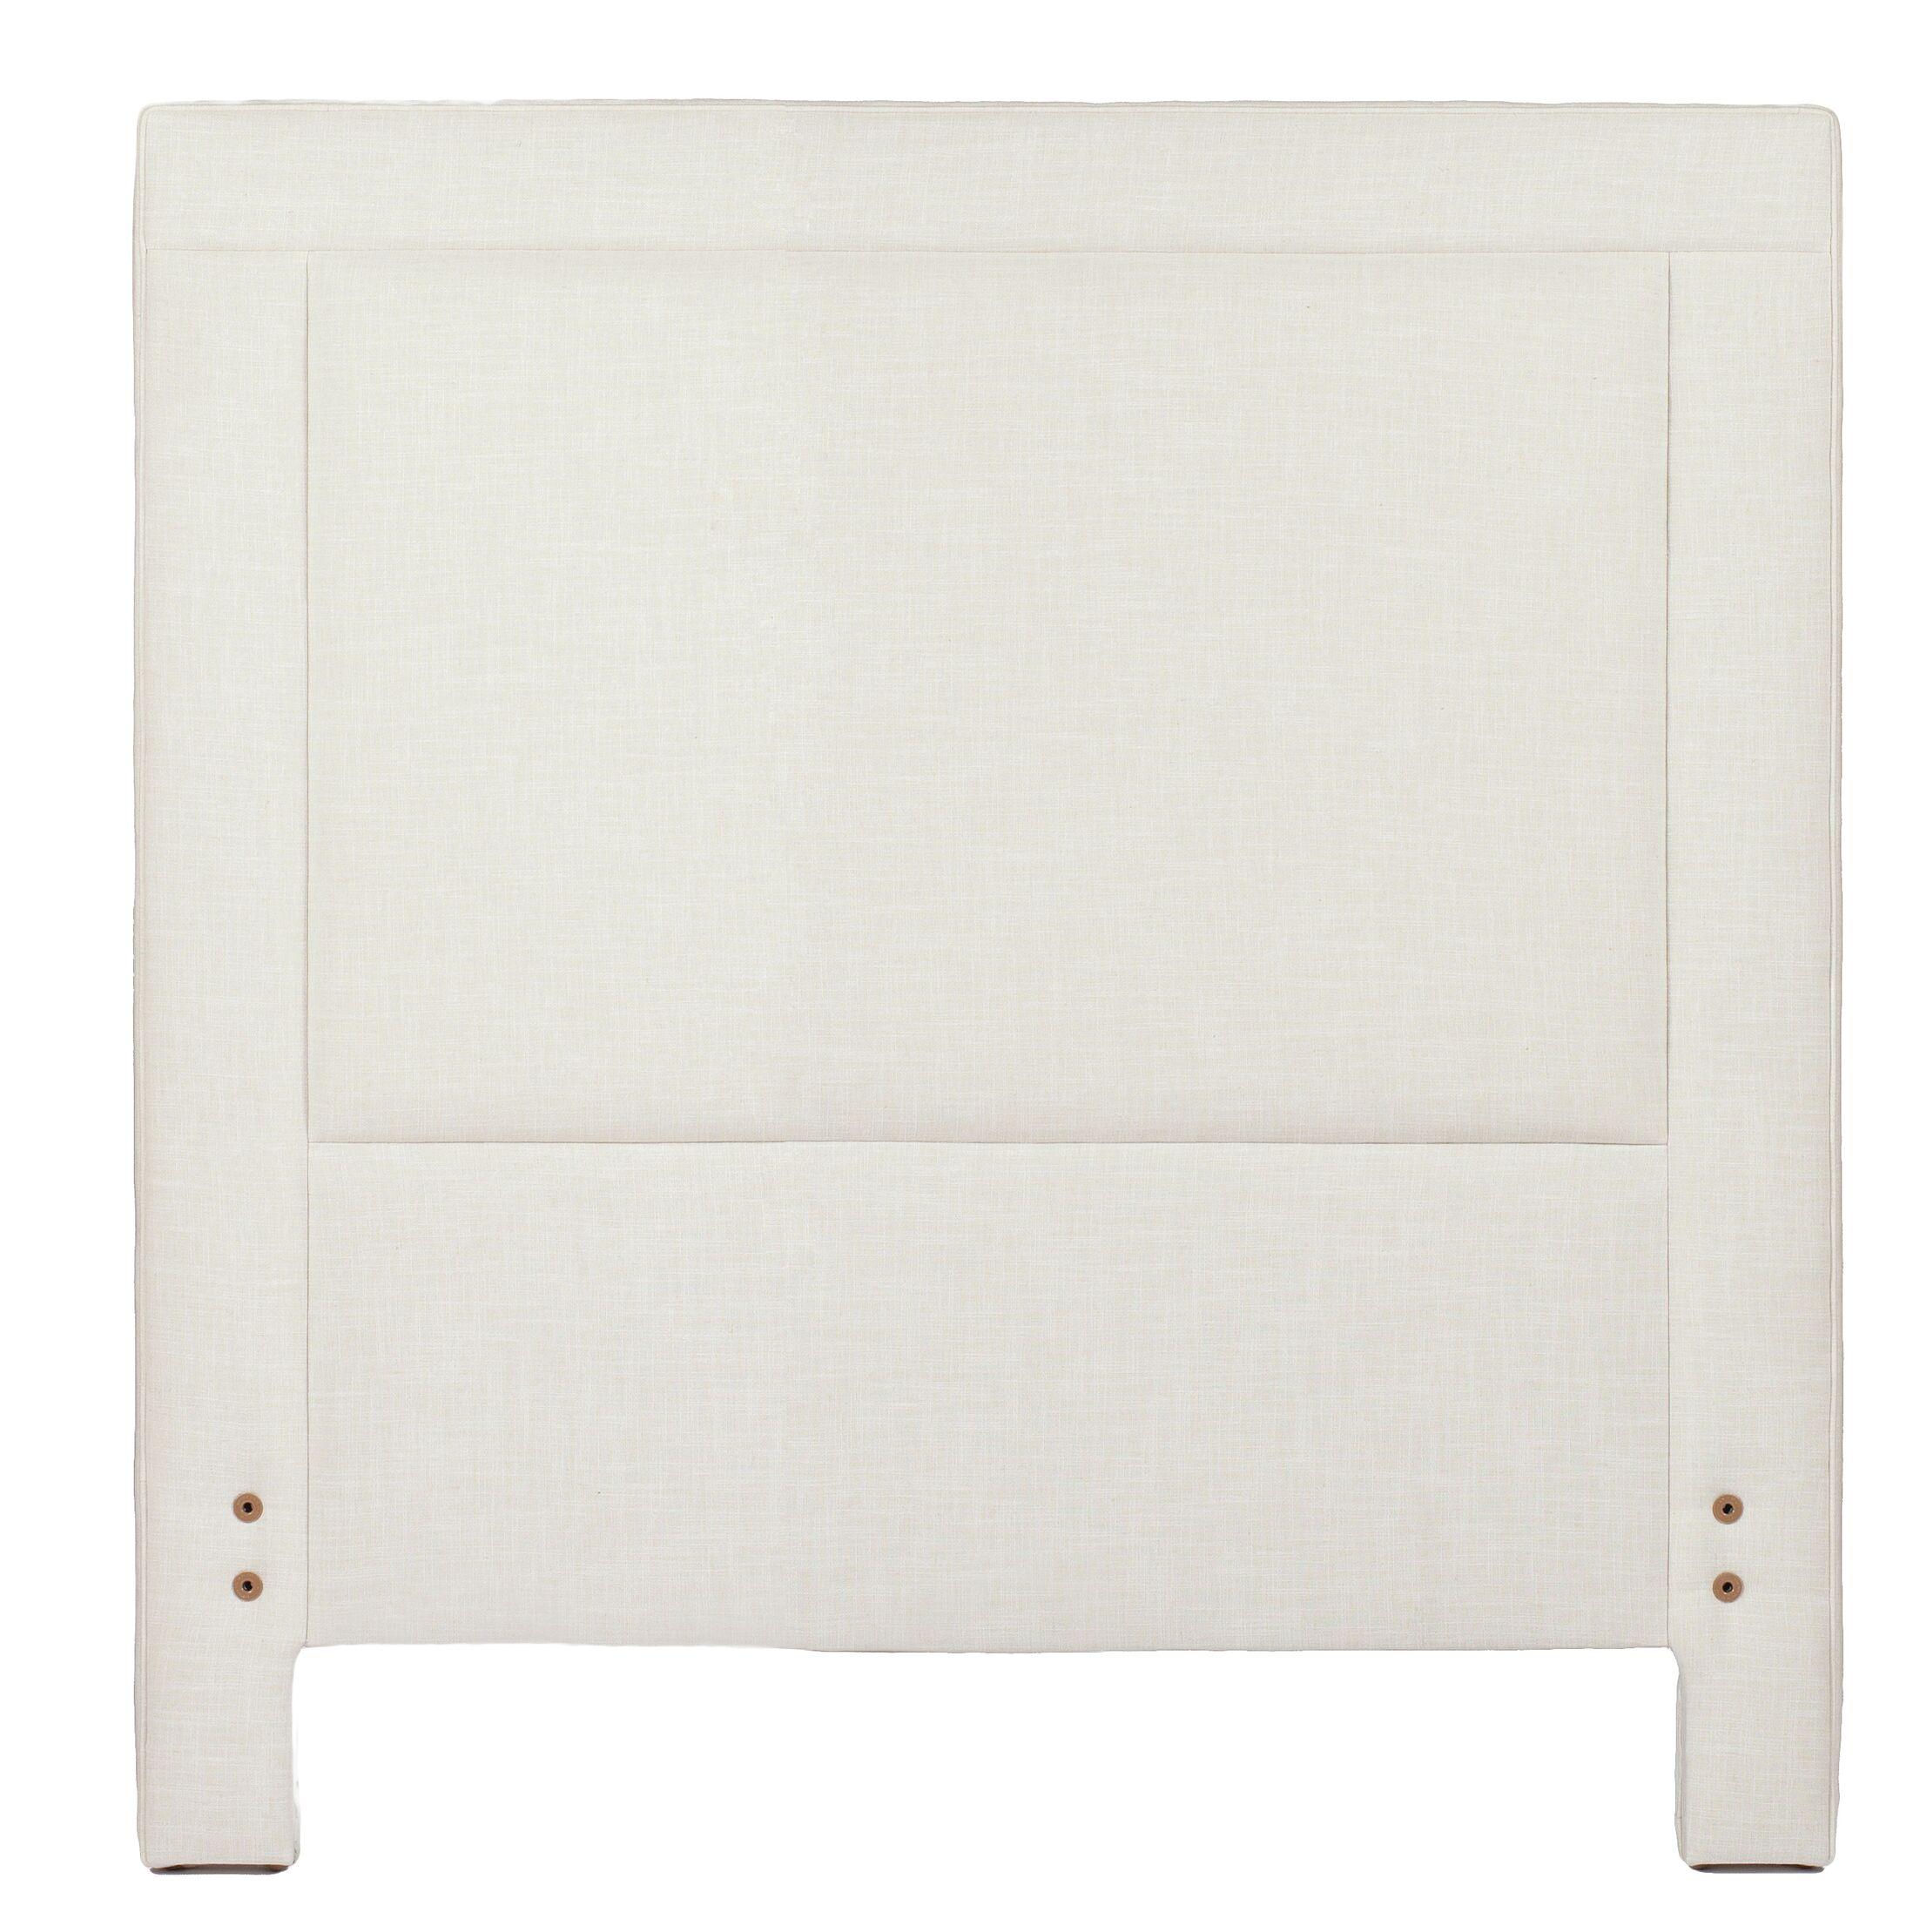 Sloan Upholstered Panel Headboard Size: King, Upholstery: Zulu Feather